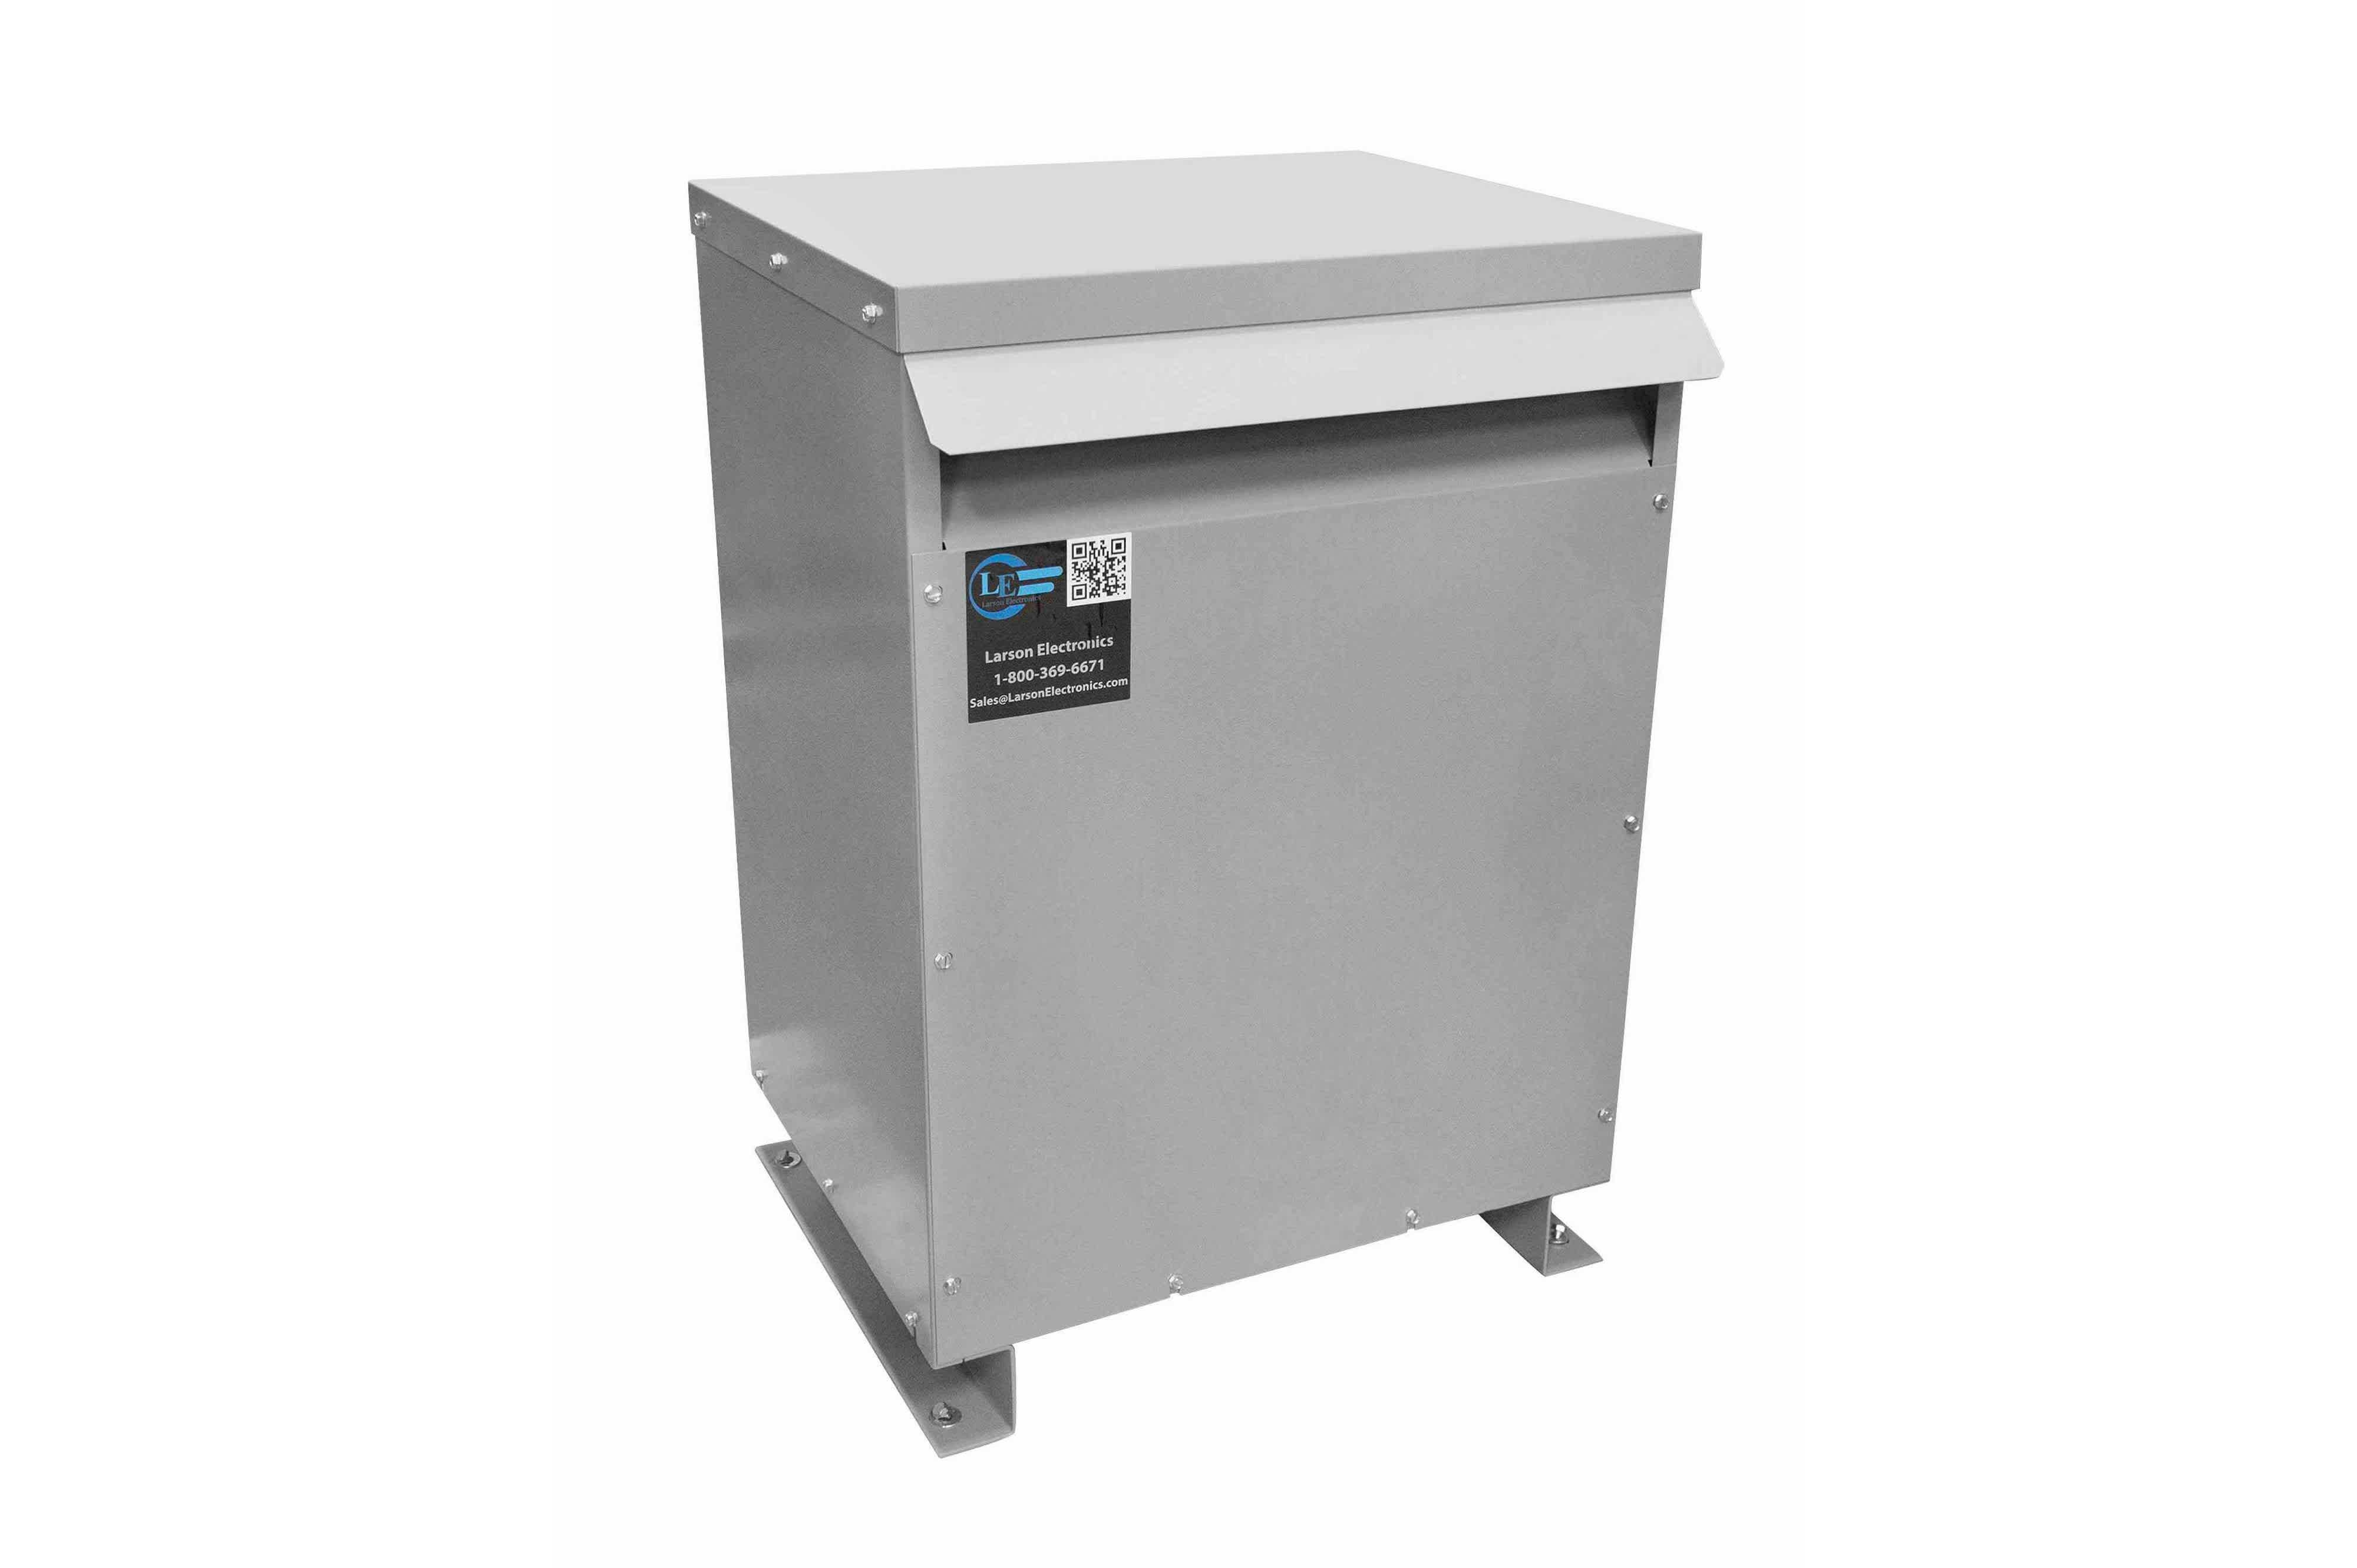 225 kVA 3PH DOE Transformer, 400V Delta Primary, 600Y/347 Wye-N Secondary, N3R, Ventilated, 60 Hz